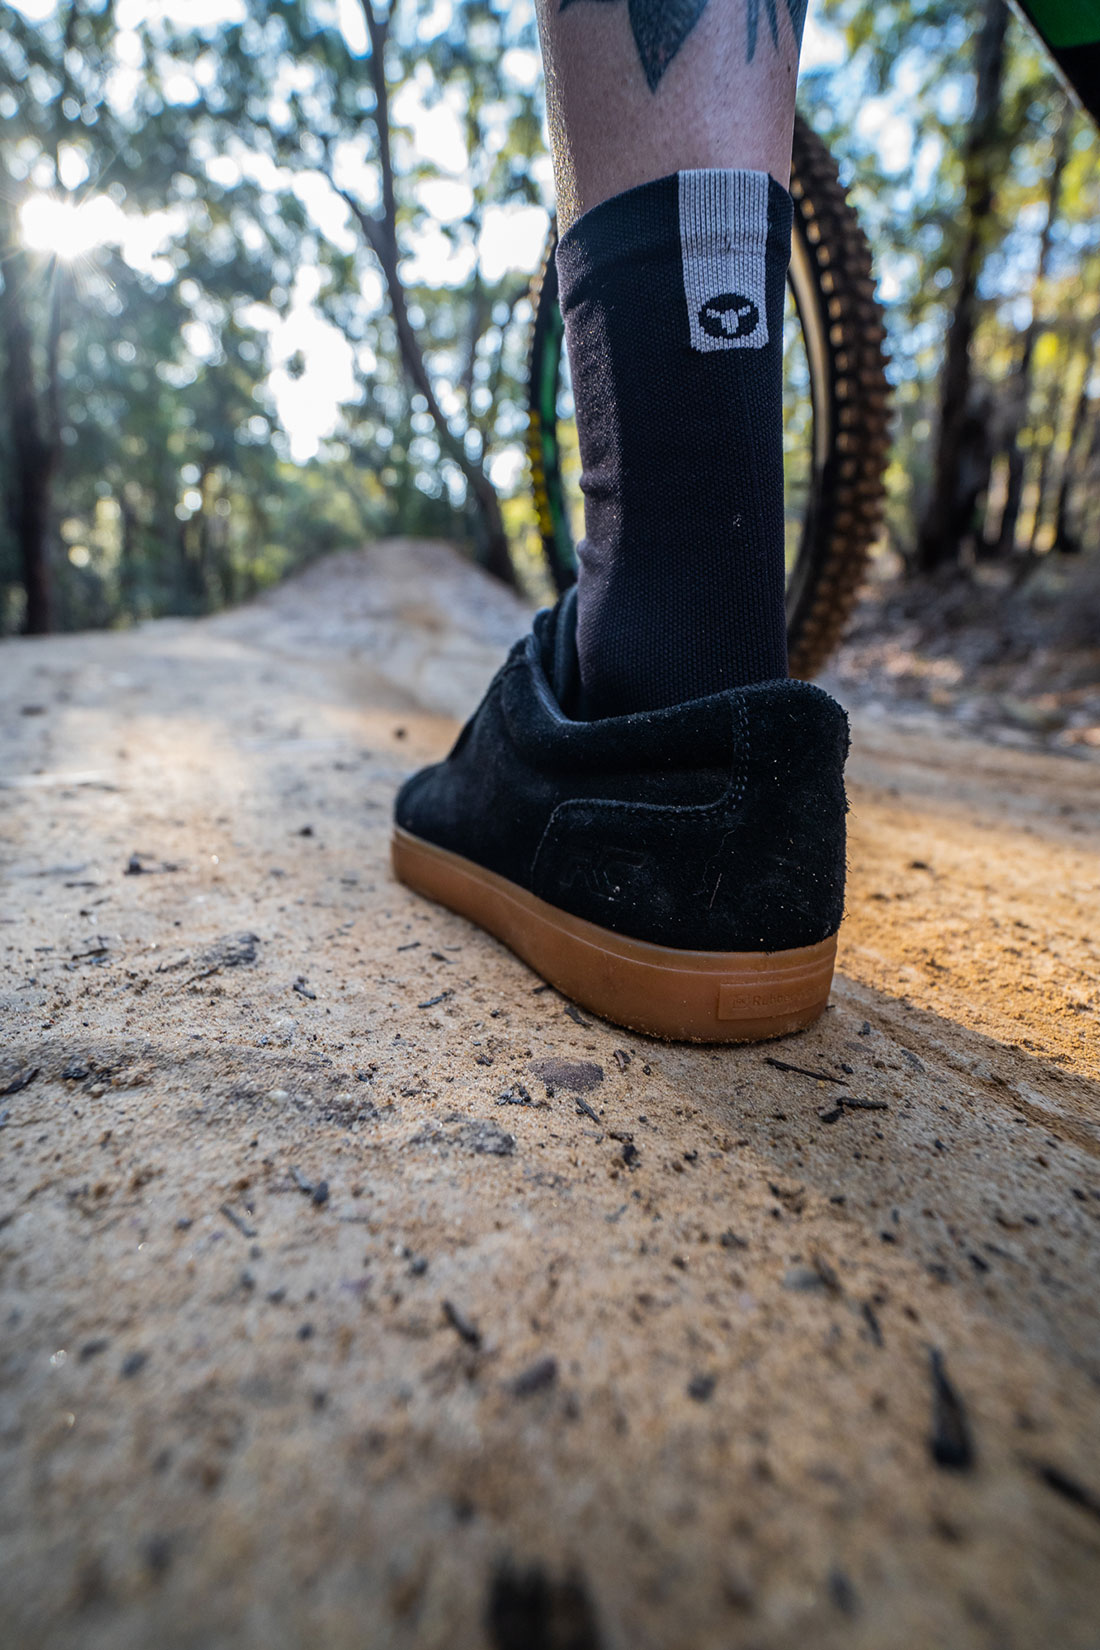 ride concepts vice shoe review